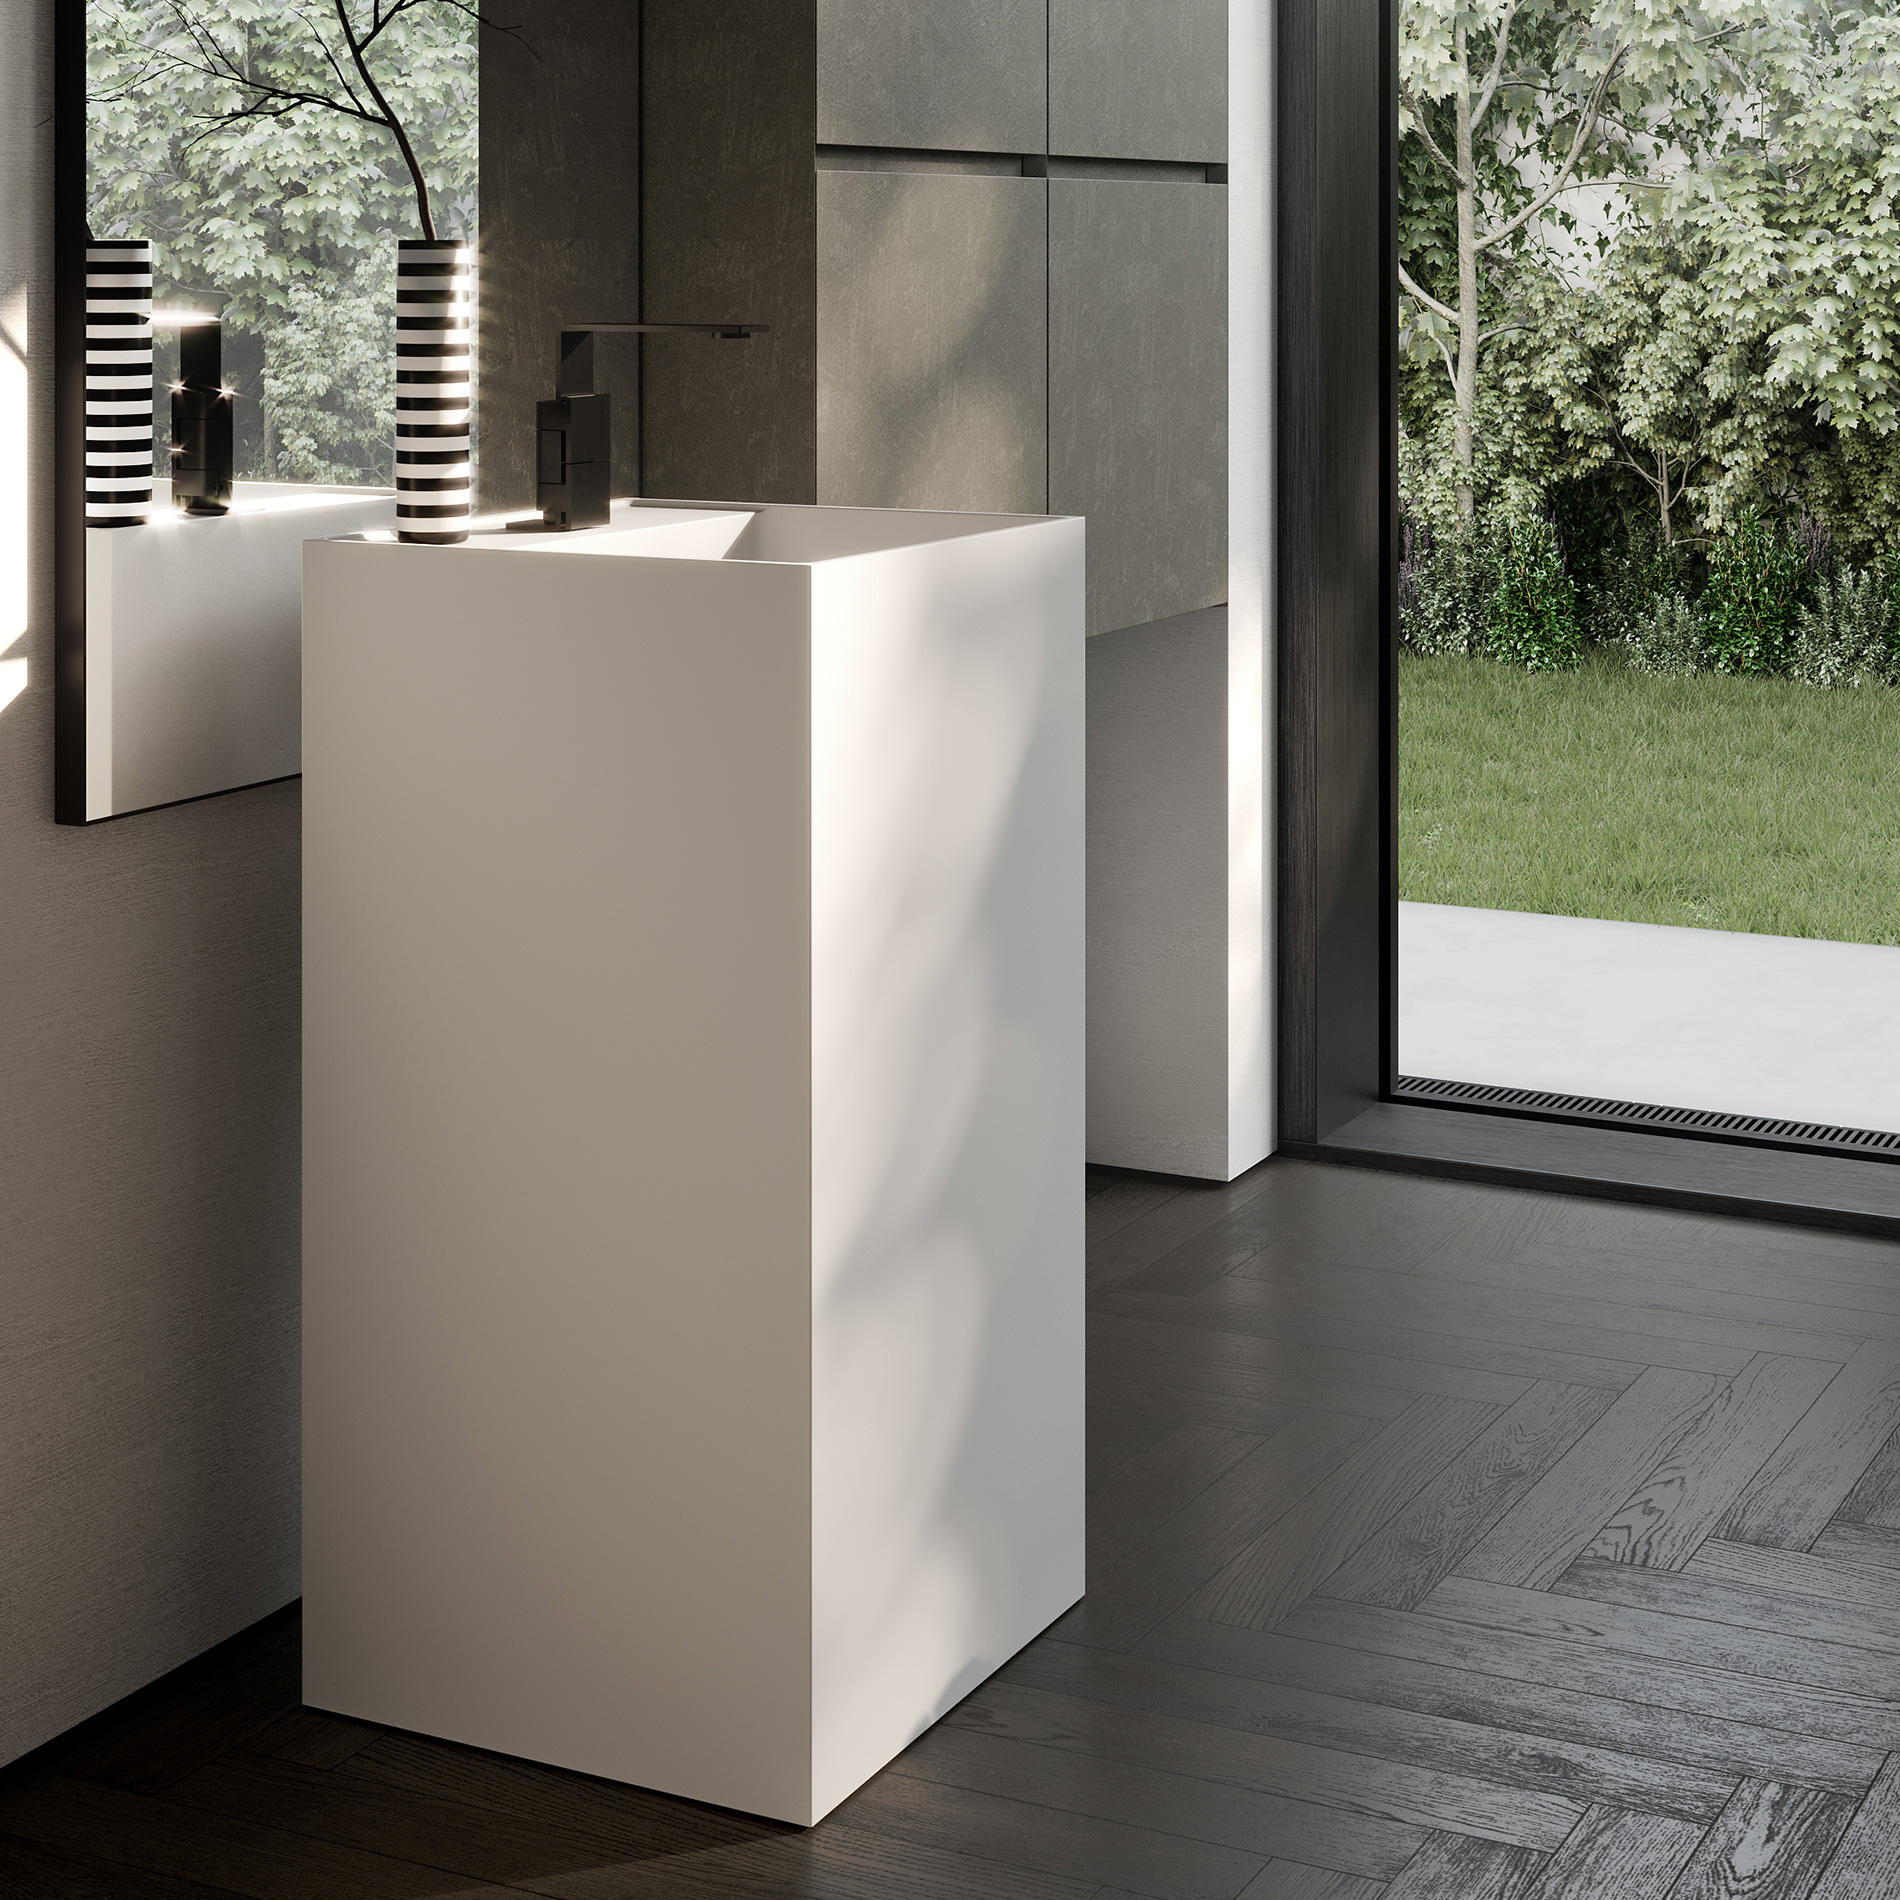 Nicos-International-home-products-Idea-Group-washbasins-1